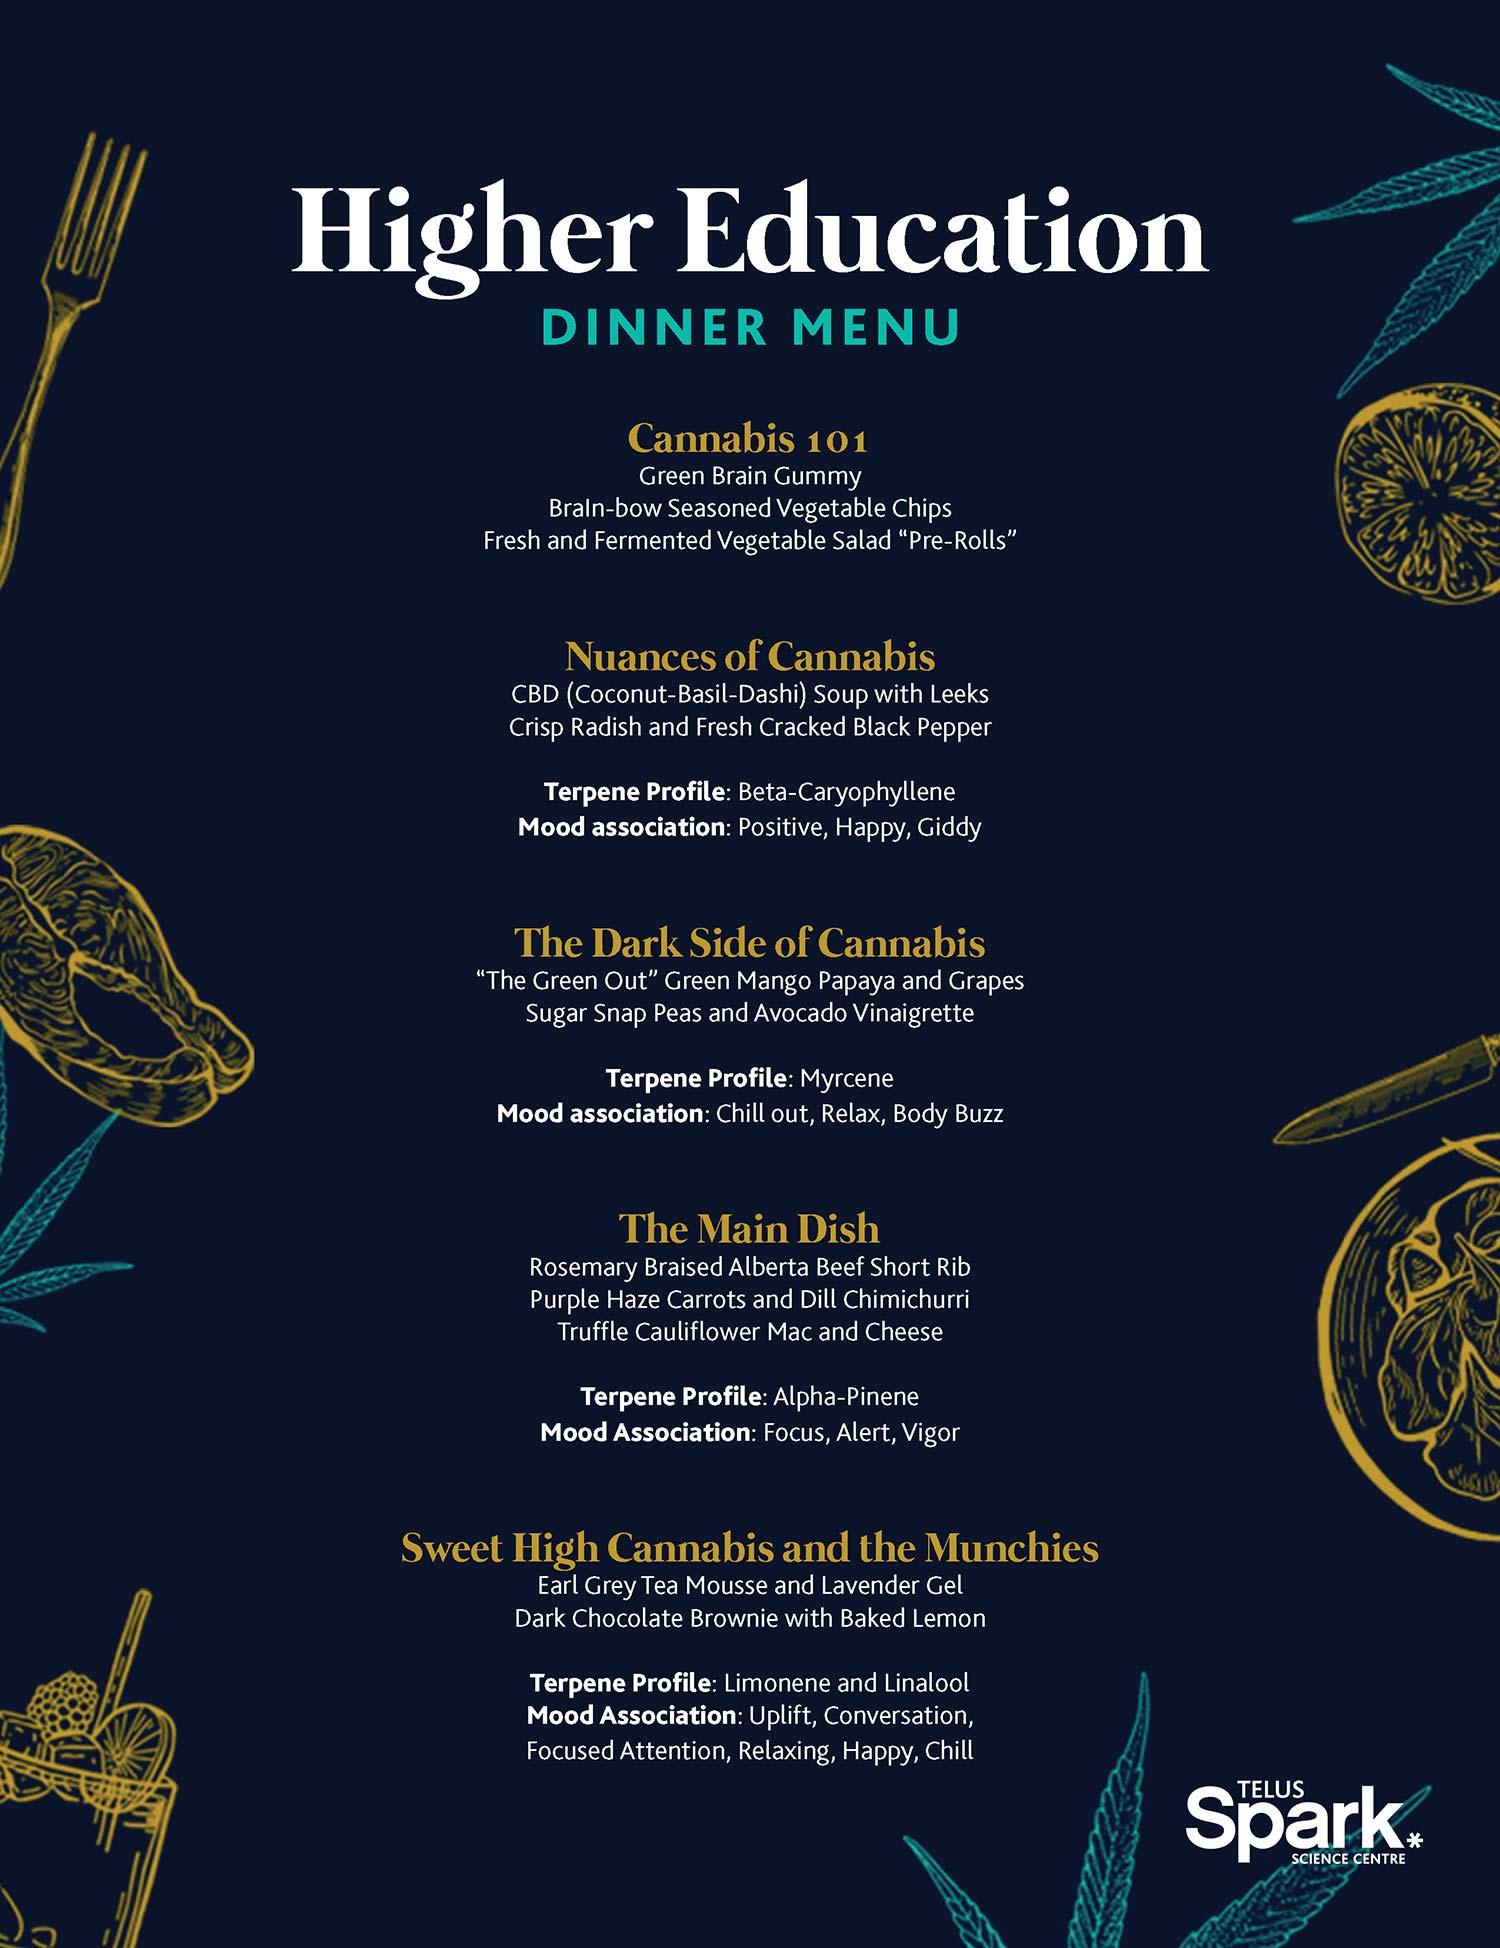 Higher Education Telus Spark Menu